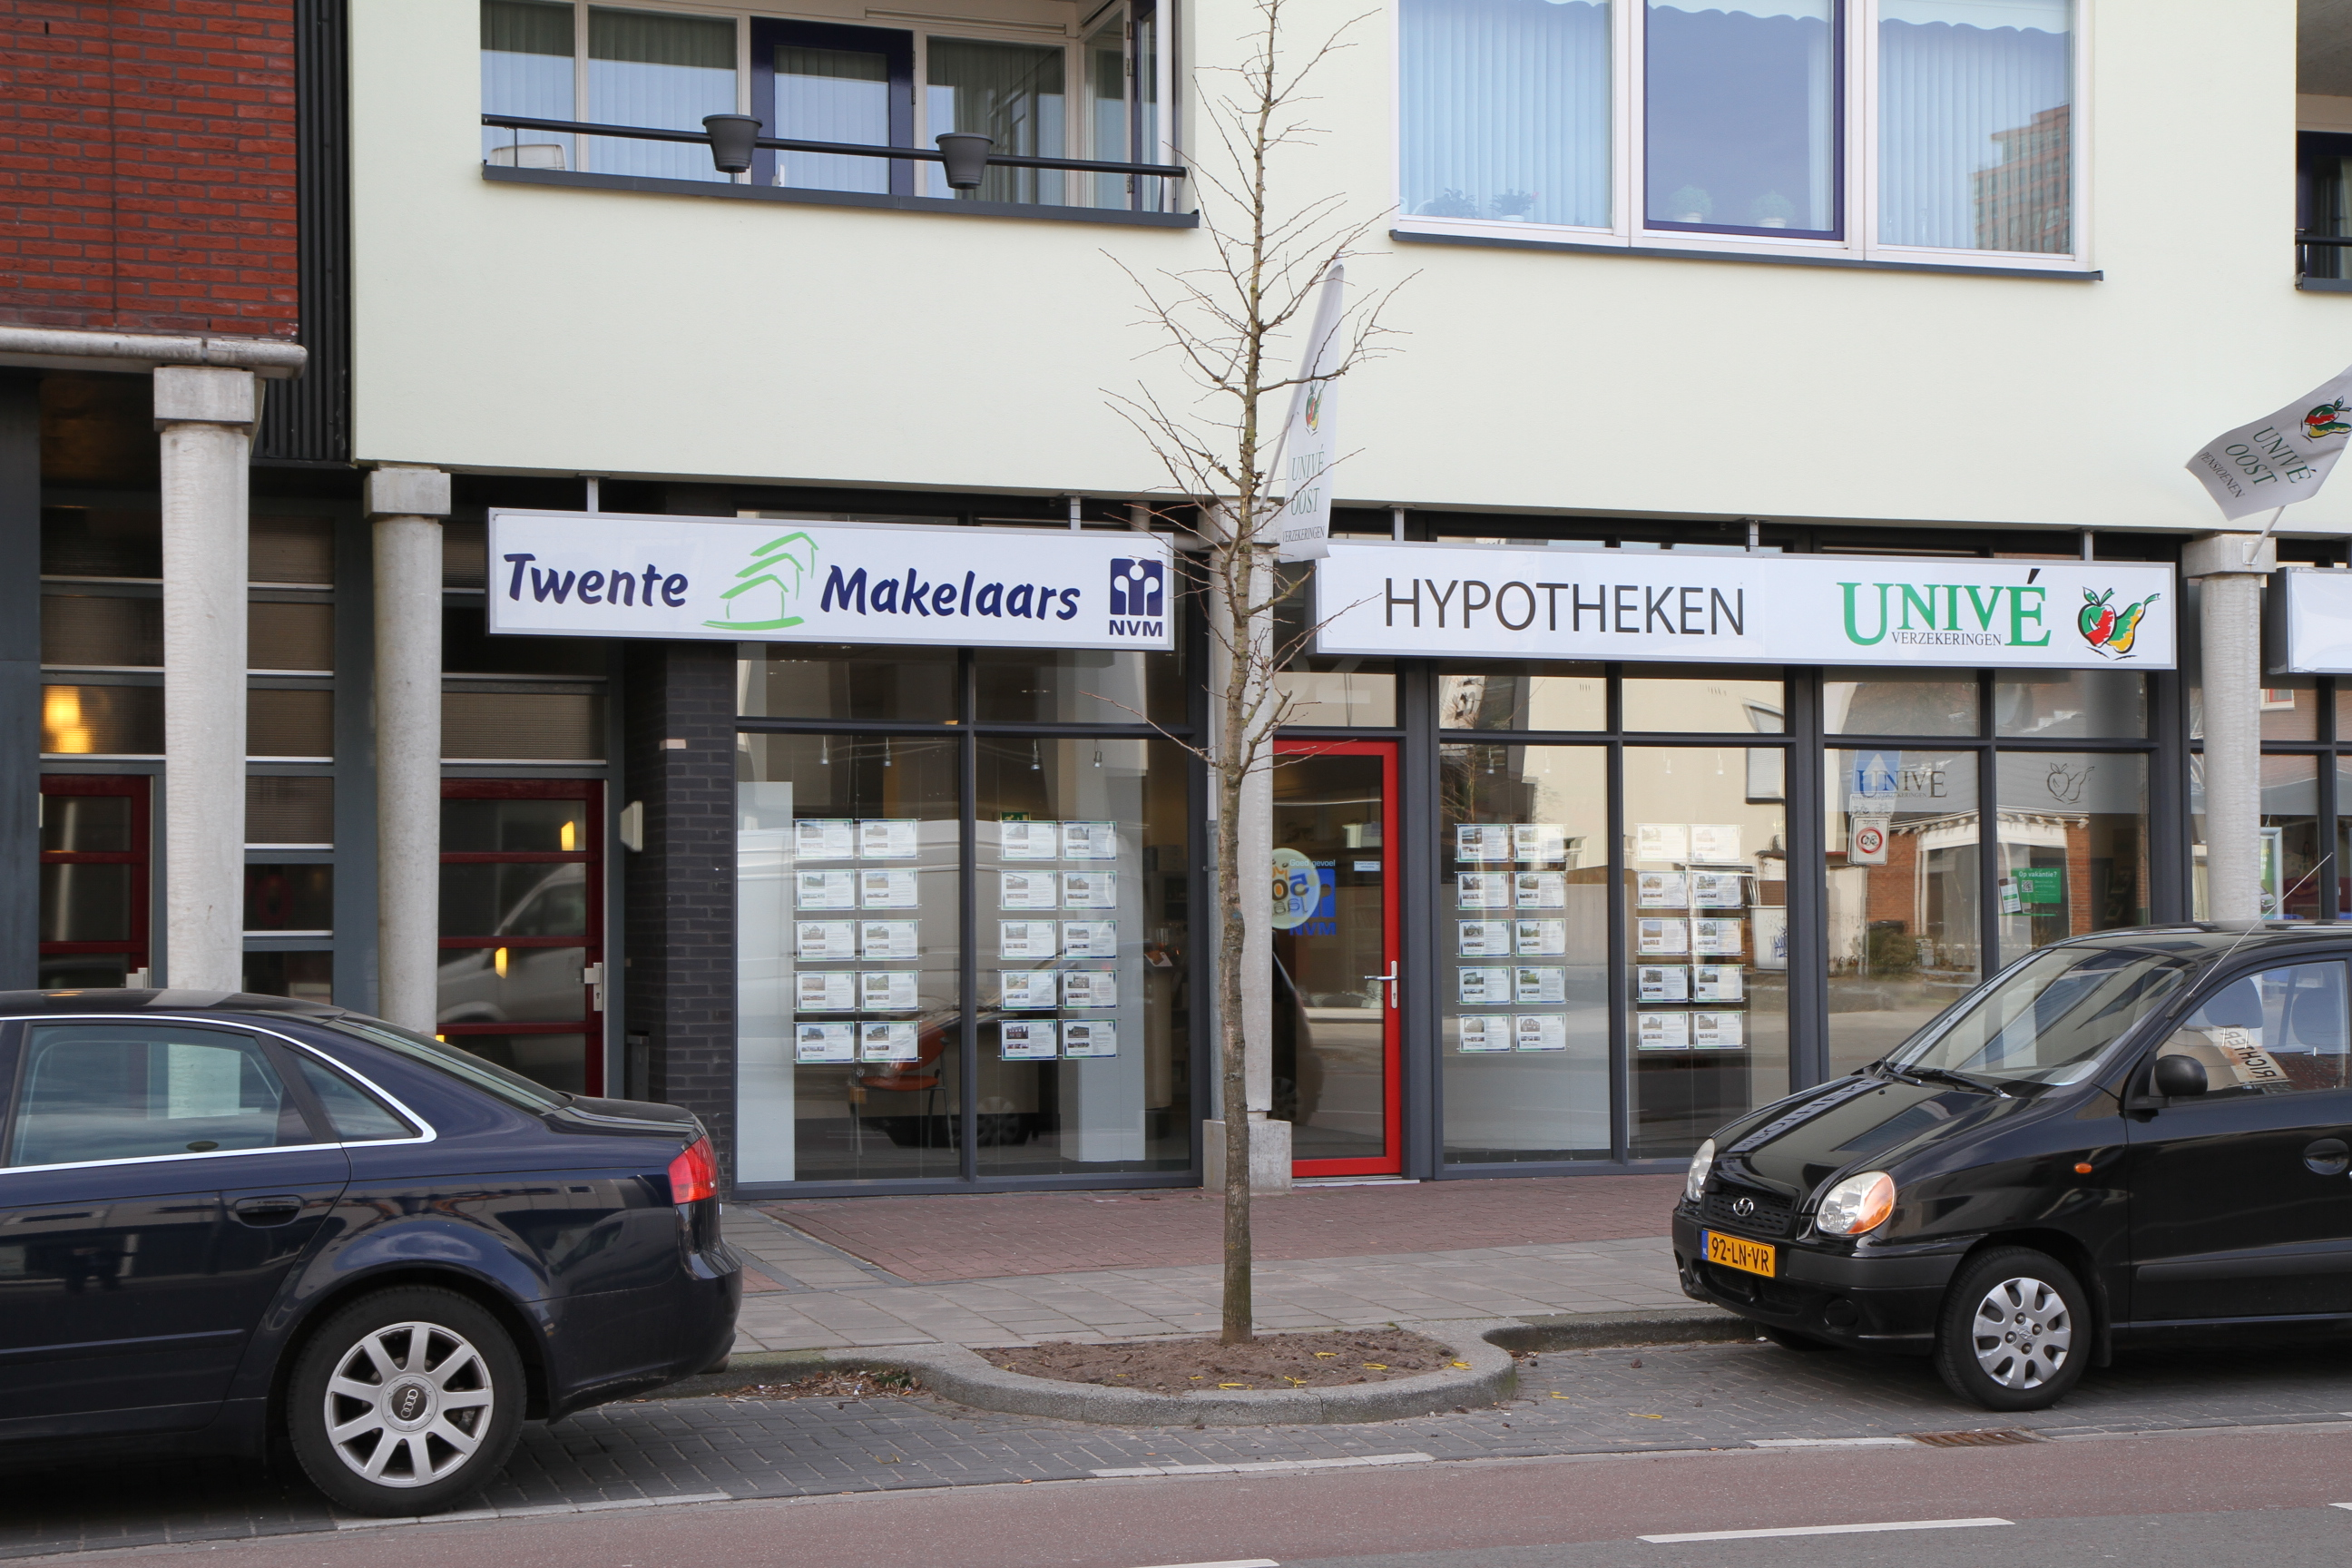 Kantoor Vestiging Twente Makelaars